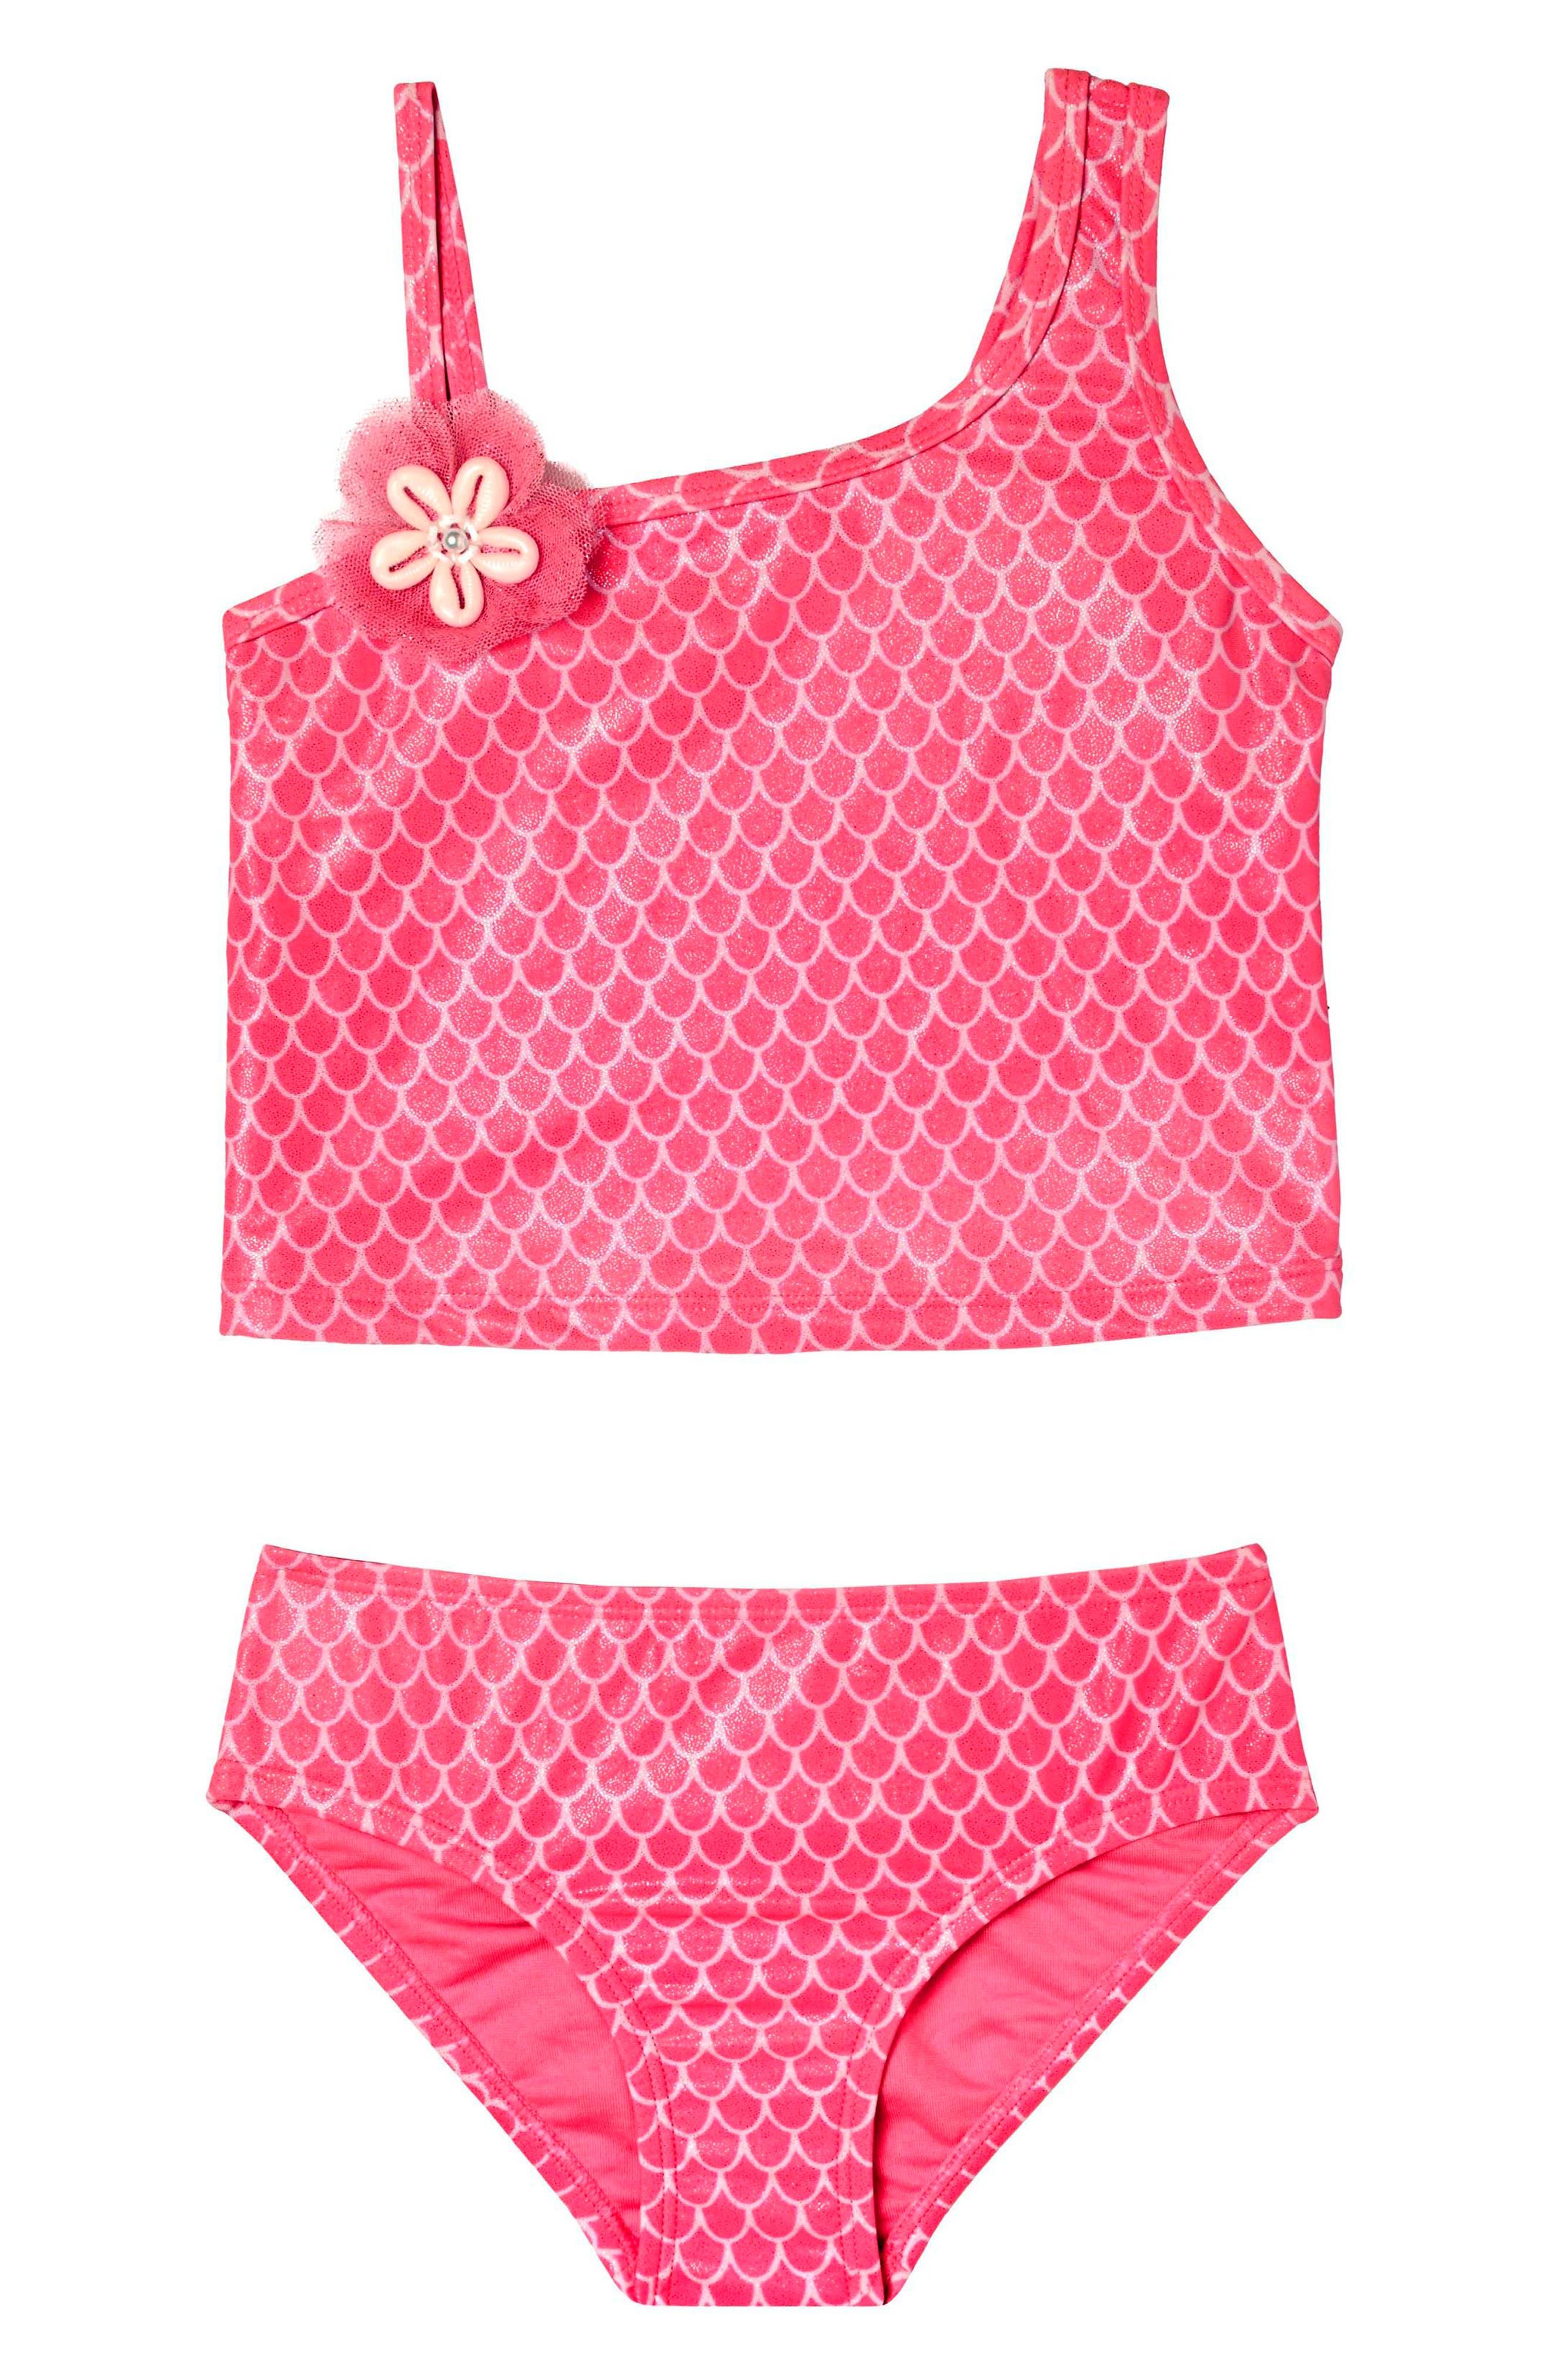 Main Image - Hula Star Mermaid Princess Two-Piece Tankini Swimsuit (Toddler Girls & Little Girls)